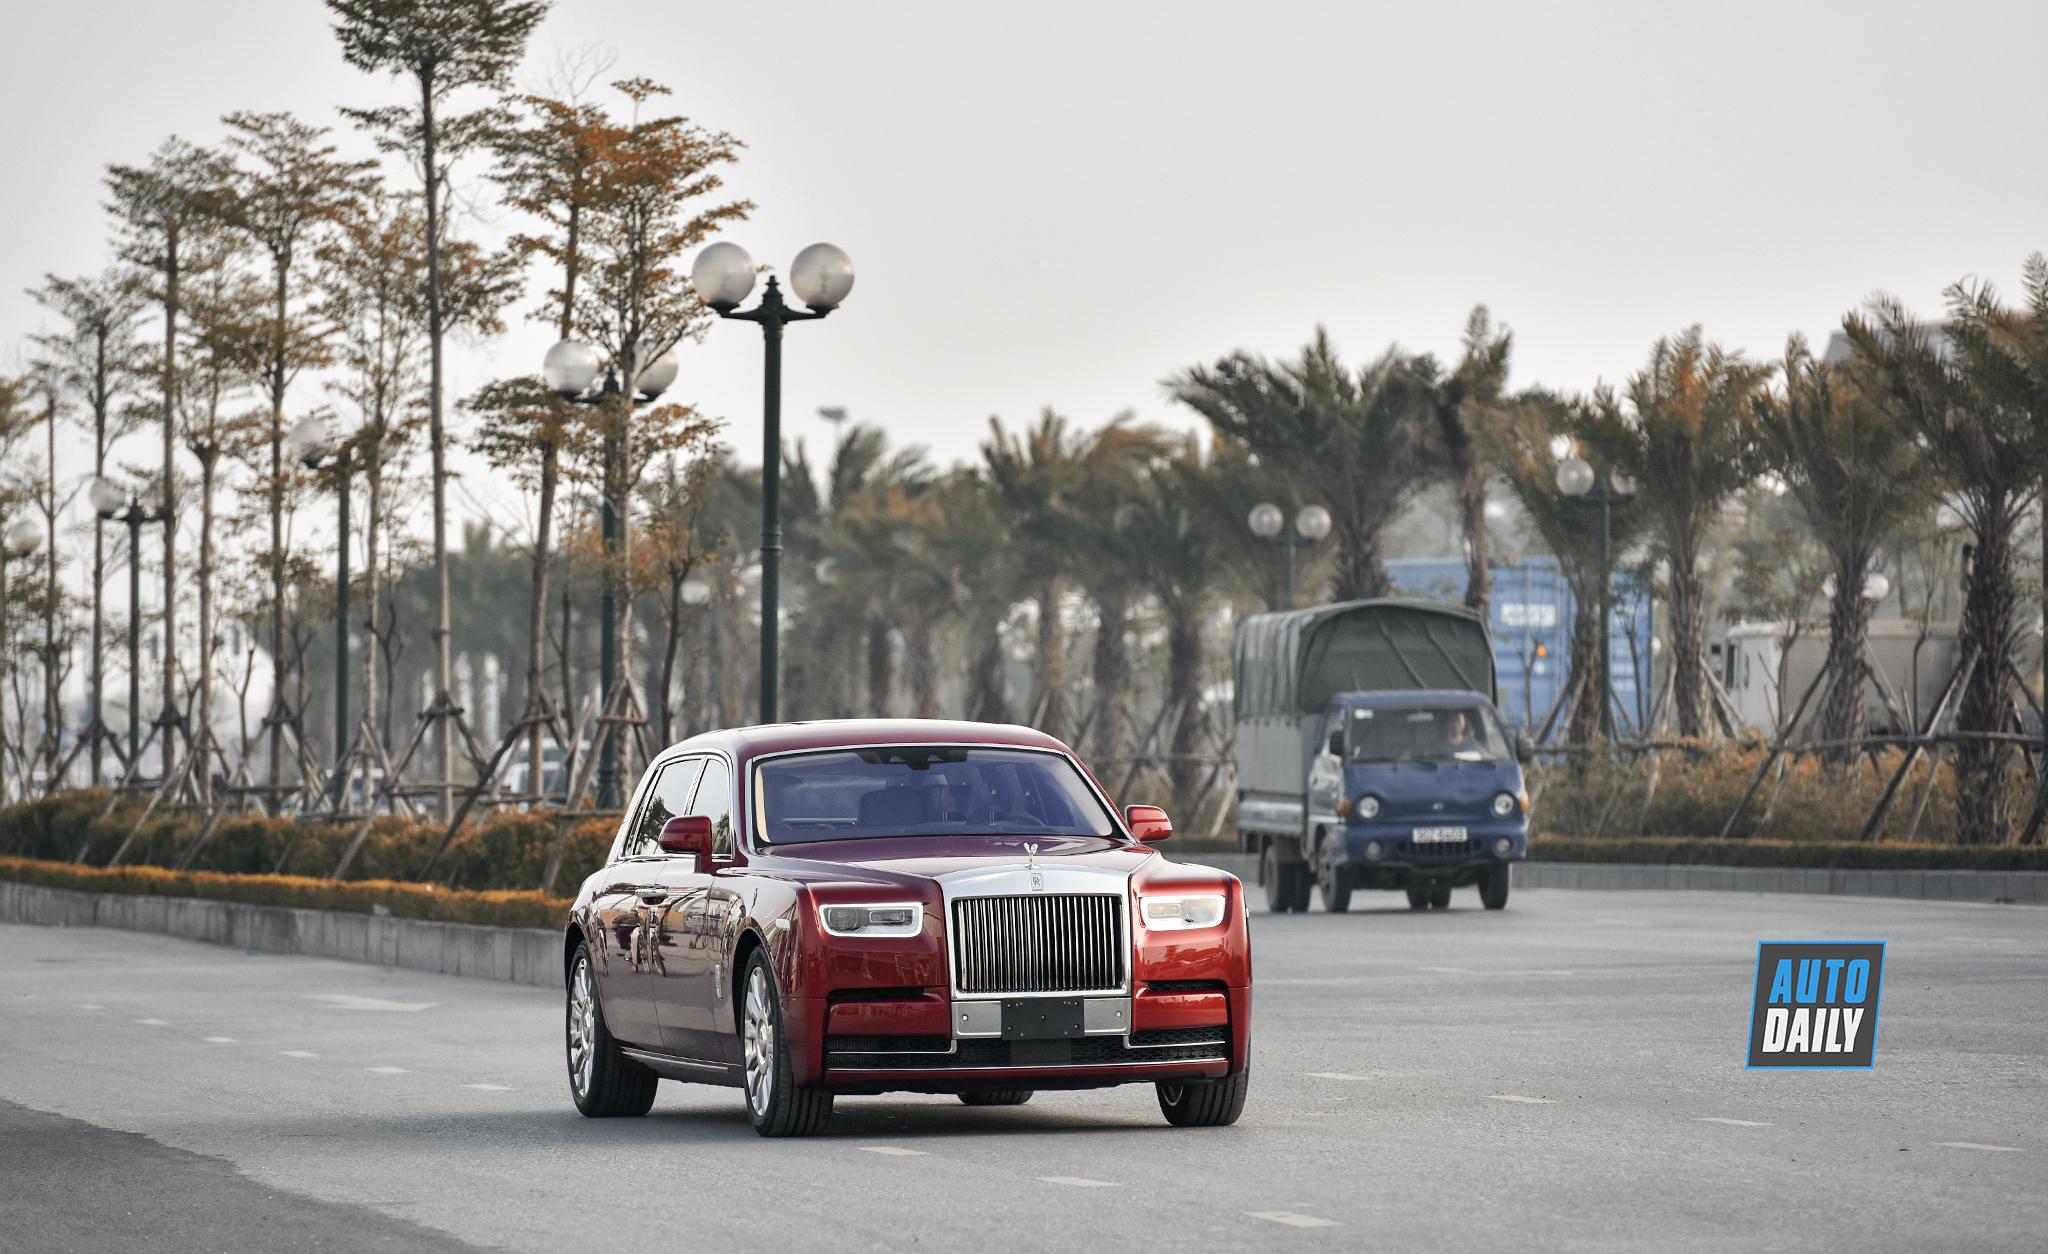 rolls-royce-phantom-2018-autodaily-6.jpg